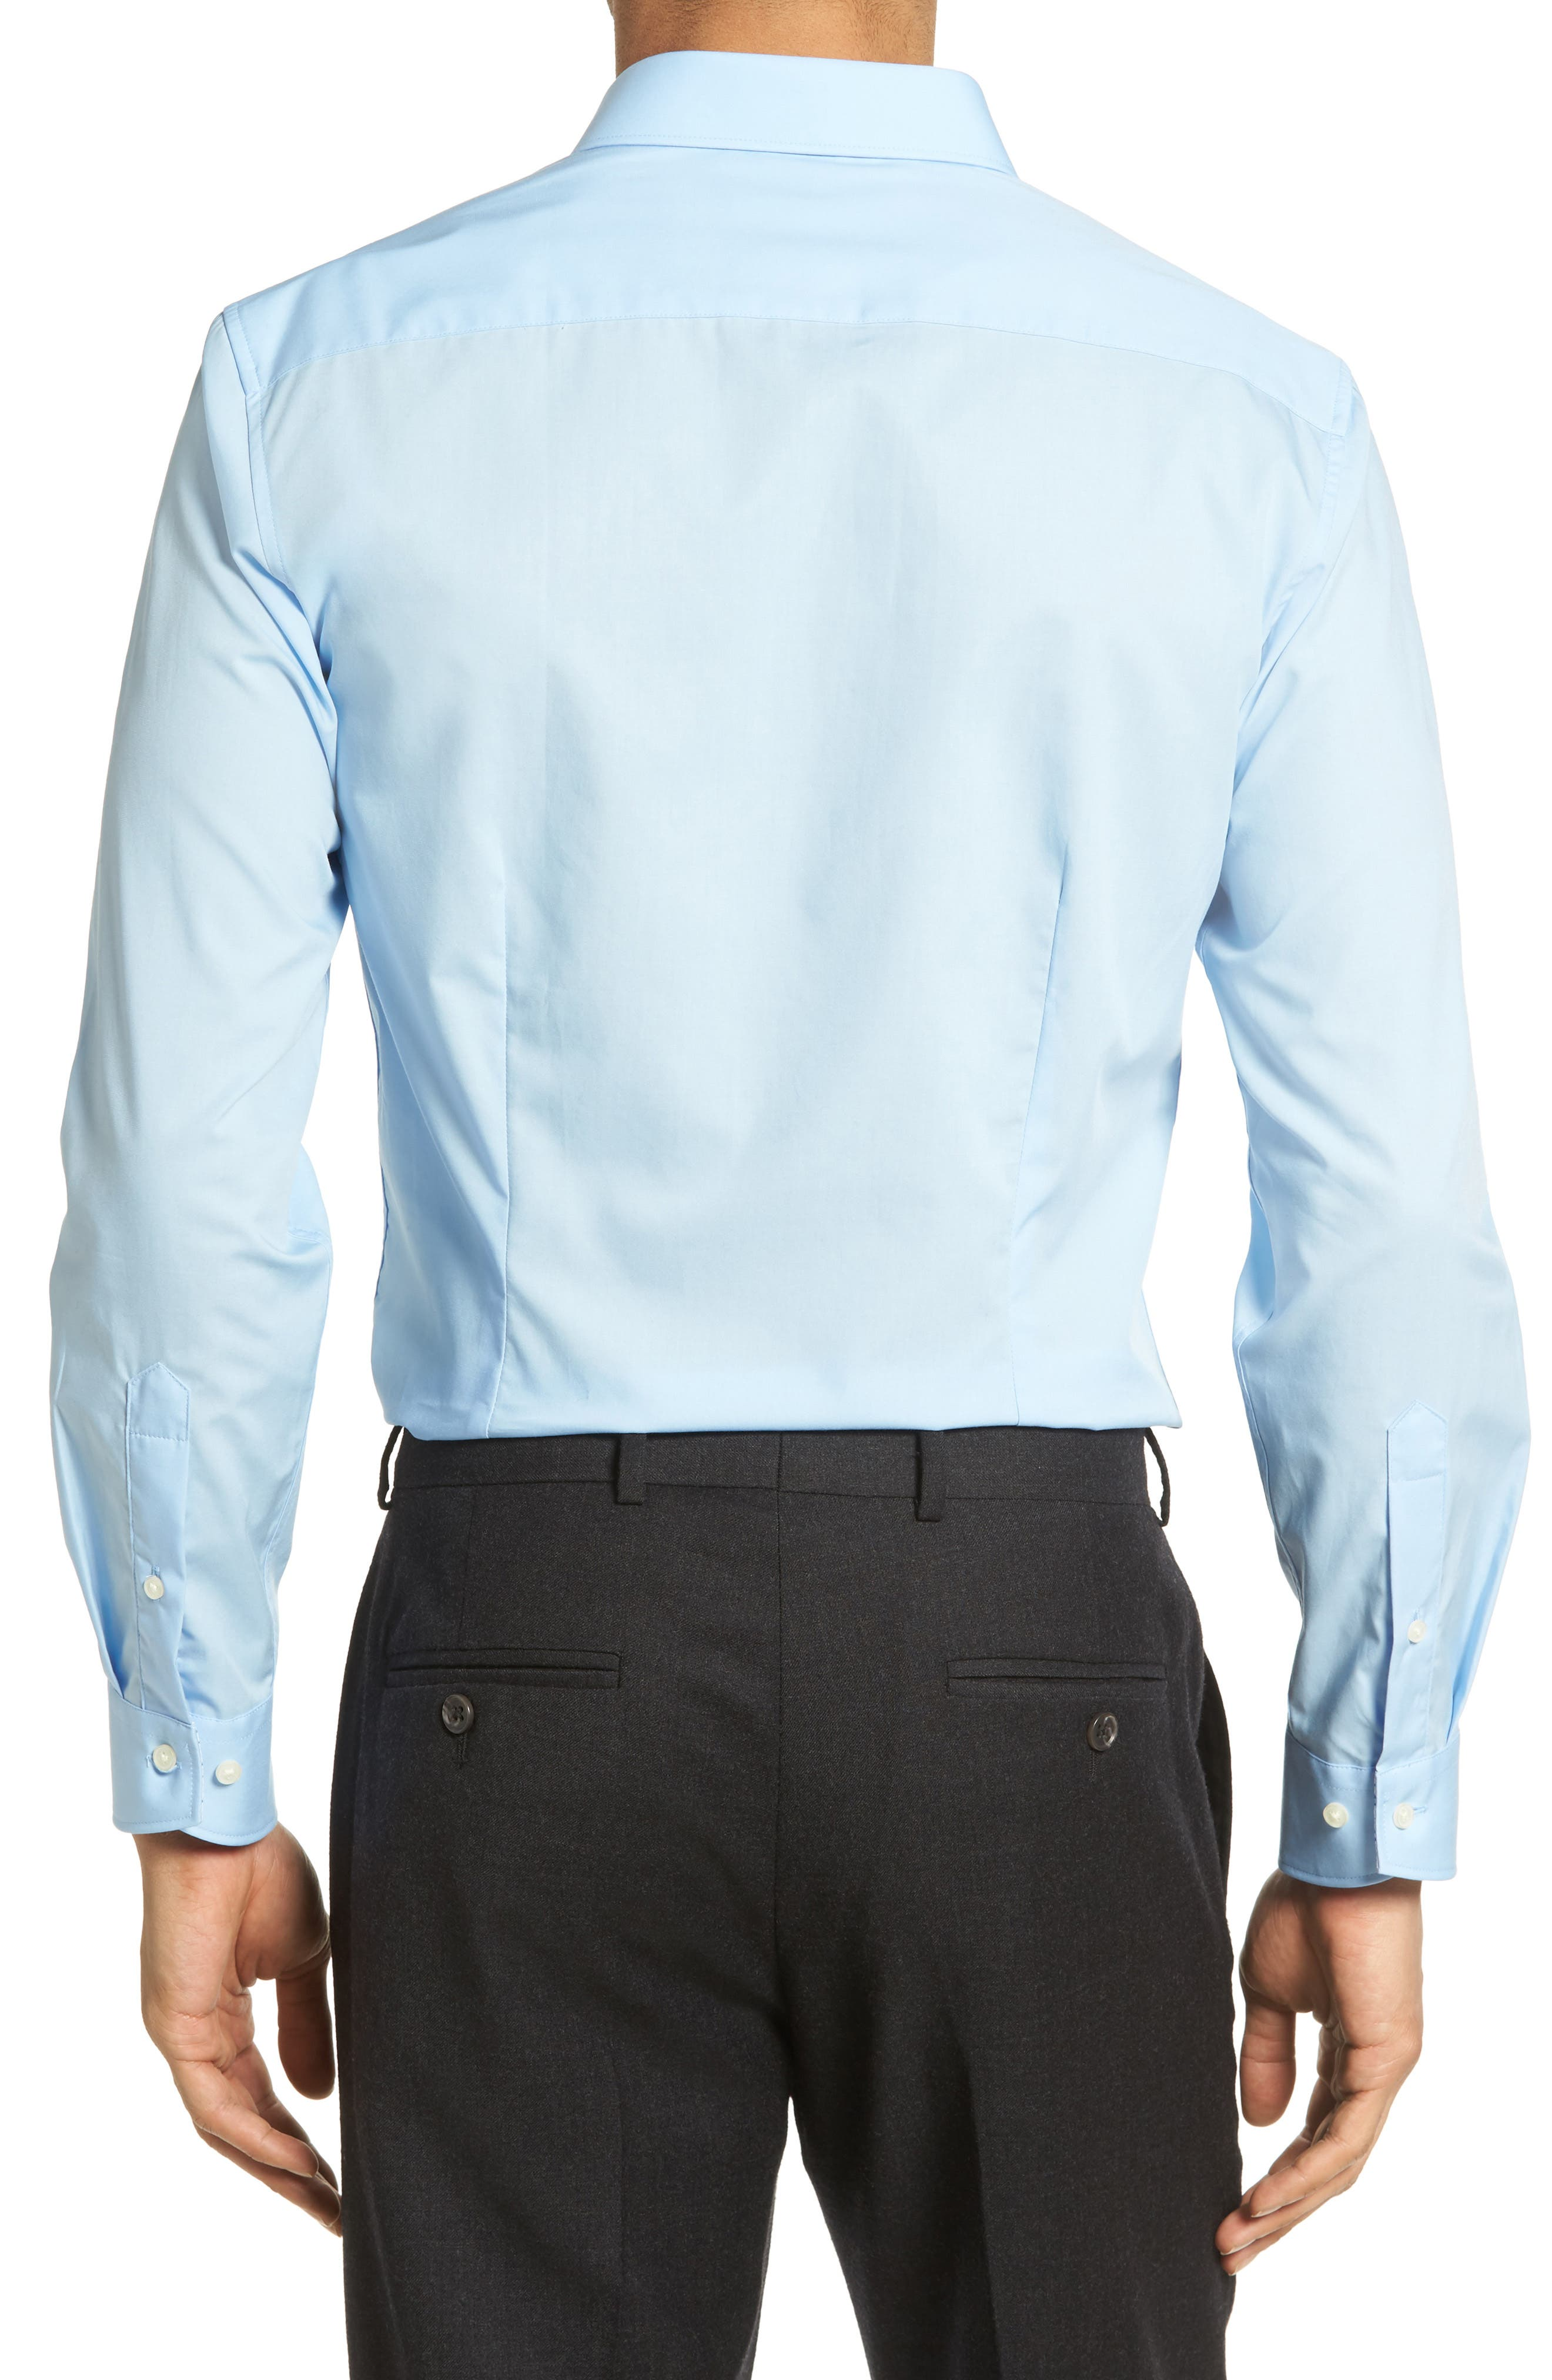 Booker Slim Fit Dress Shirt,                             Alternate thumbnail 4, color,